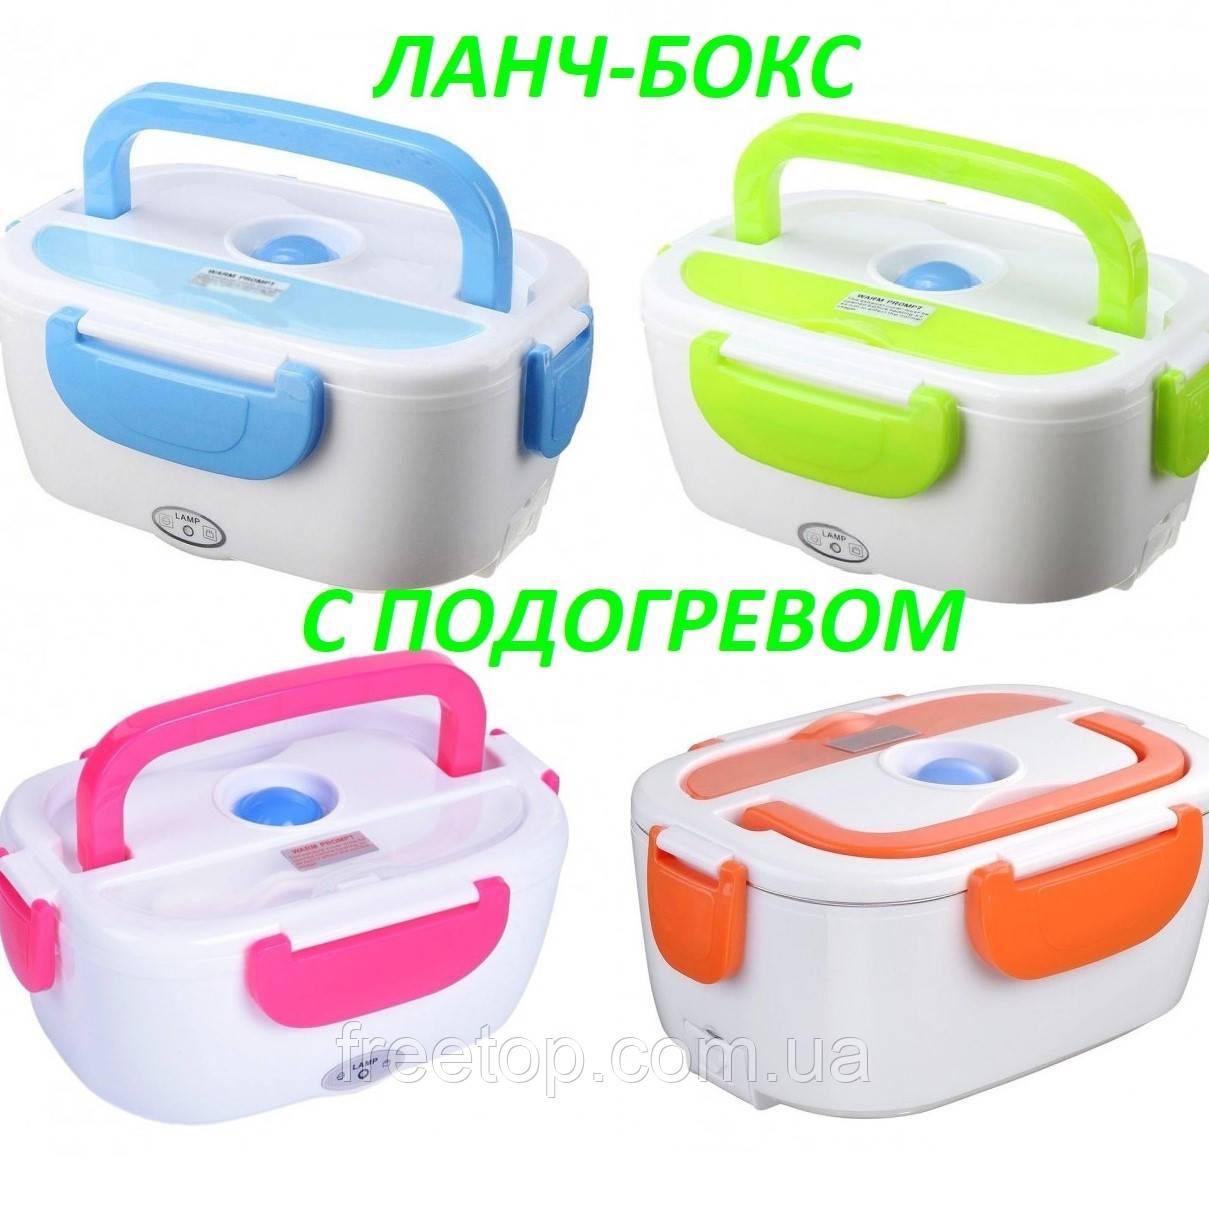 Lunch Box (Ланч Бокс с подогревом) The Electric Lunch Box